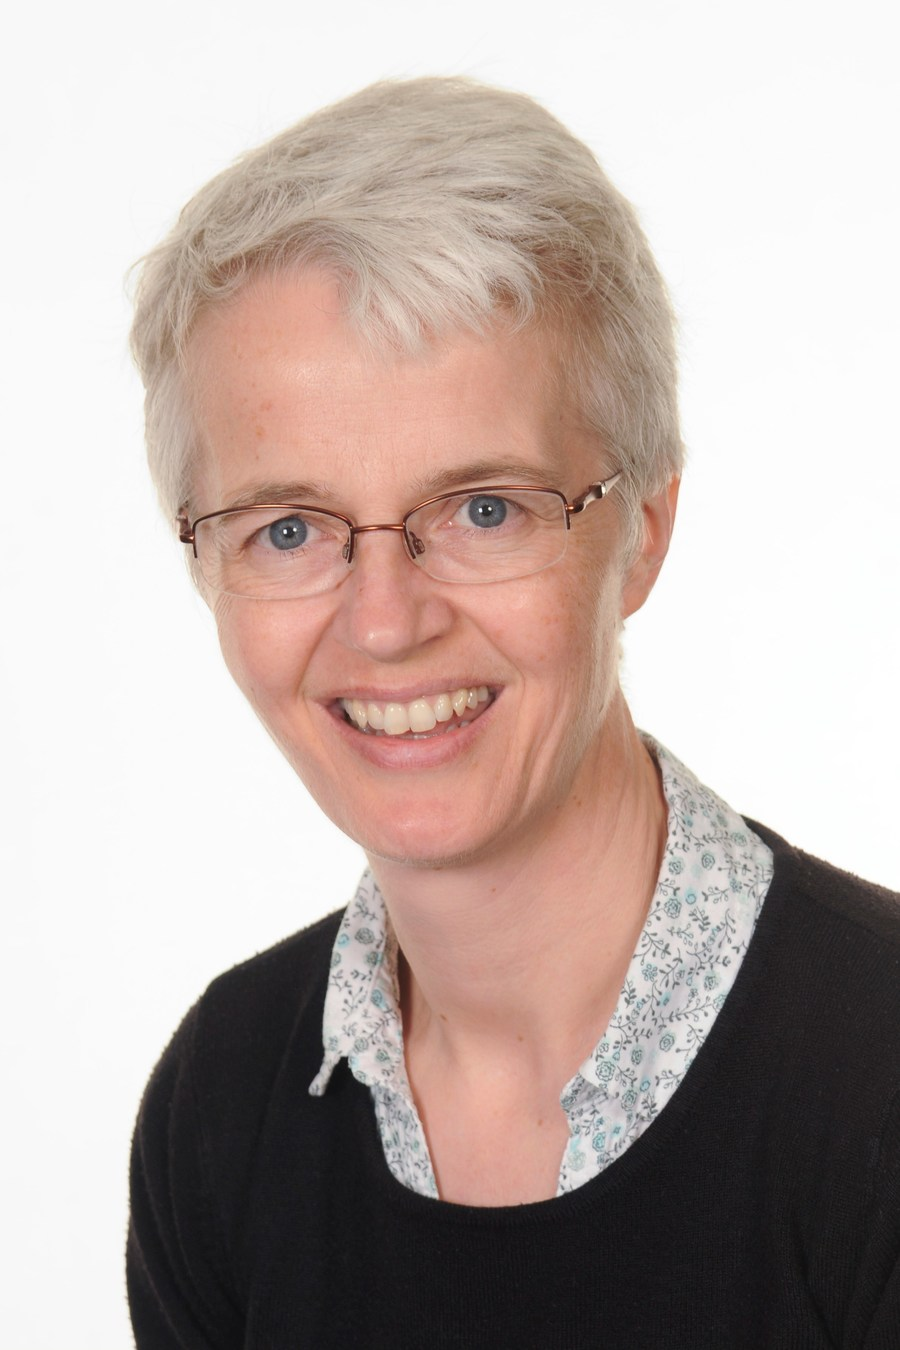 Catherine Edge BEd (Hons); Teacher / Head of Centre / SLT